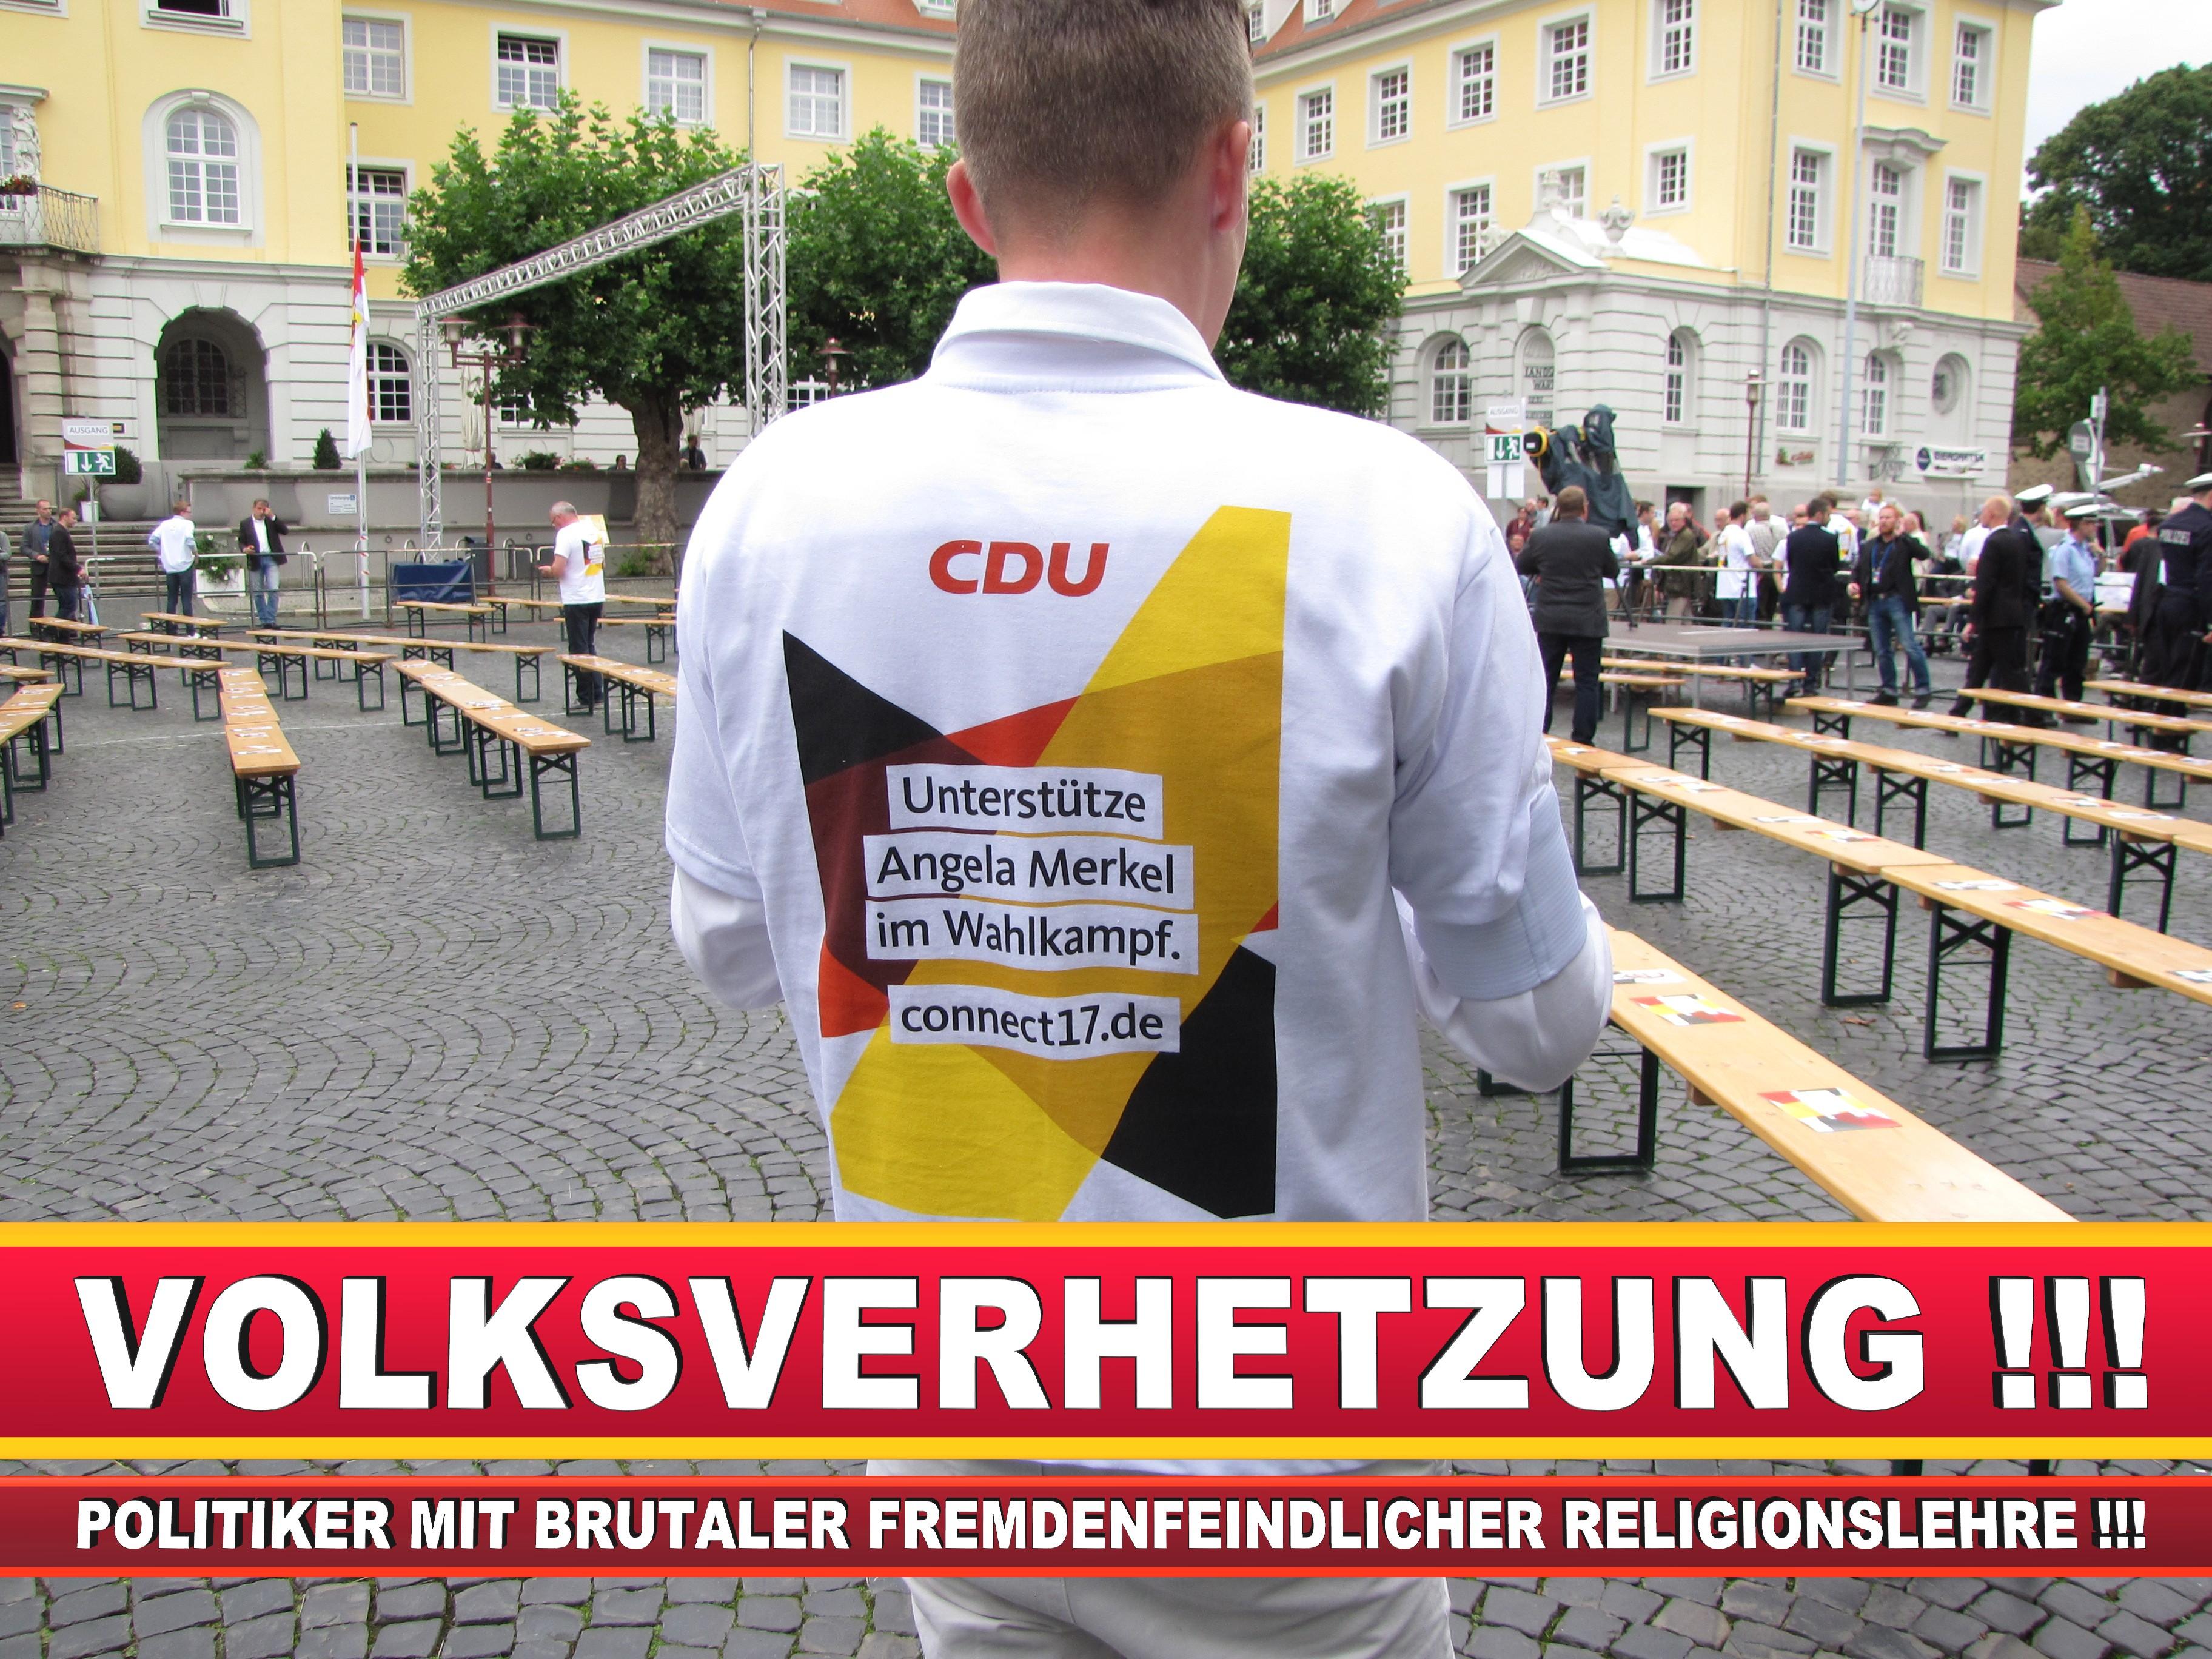 CDU HERFORD Kurruption Betrug Kinderpornografie Kinderpornos (18)